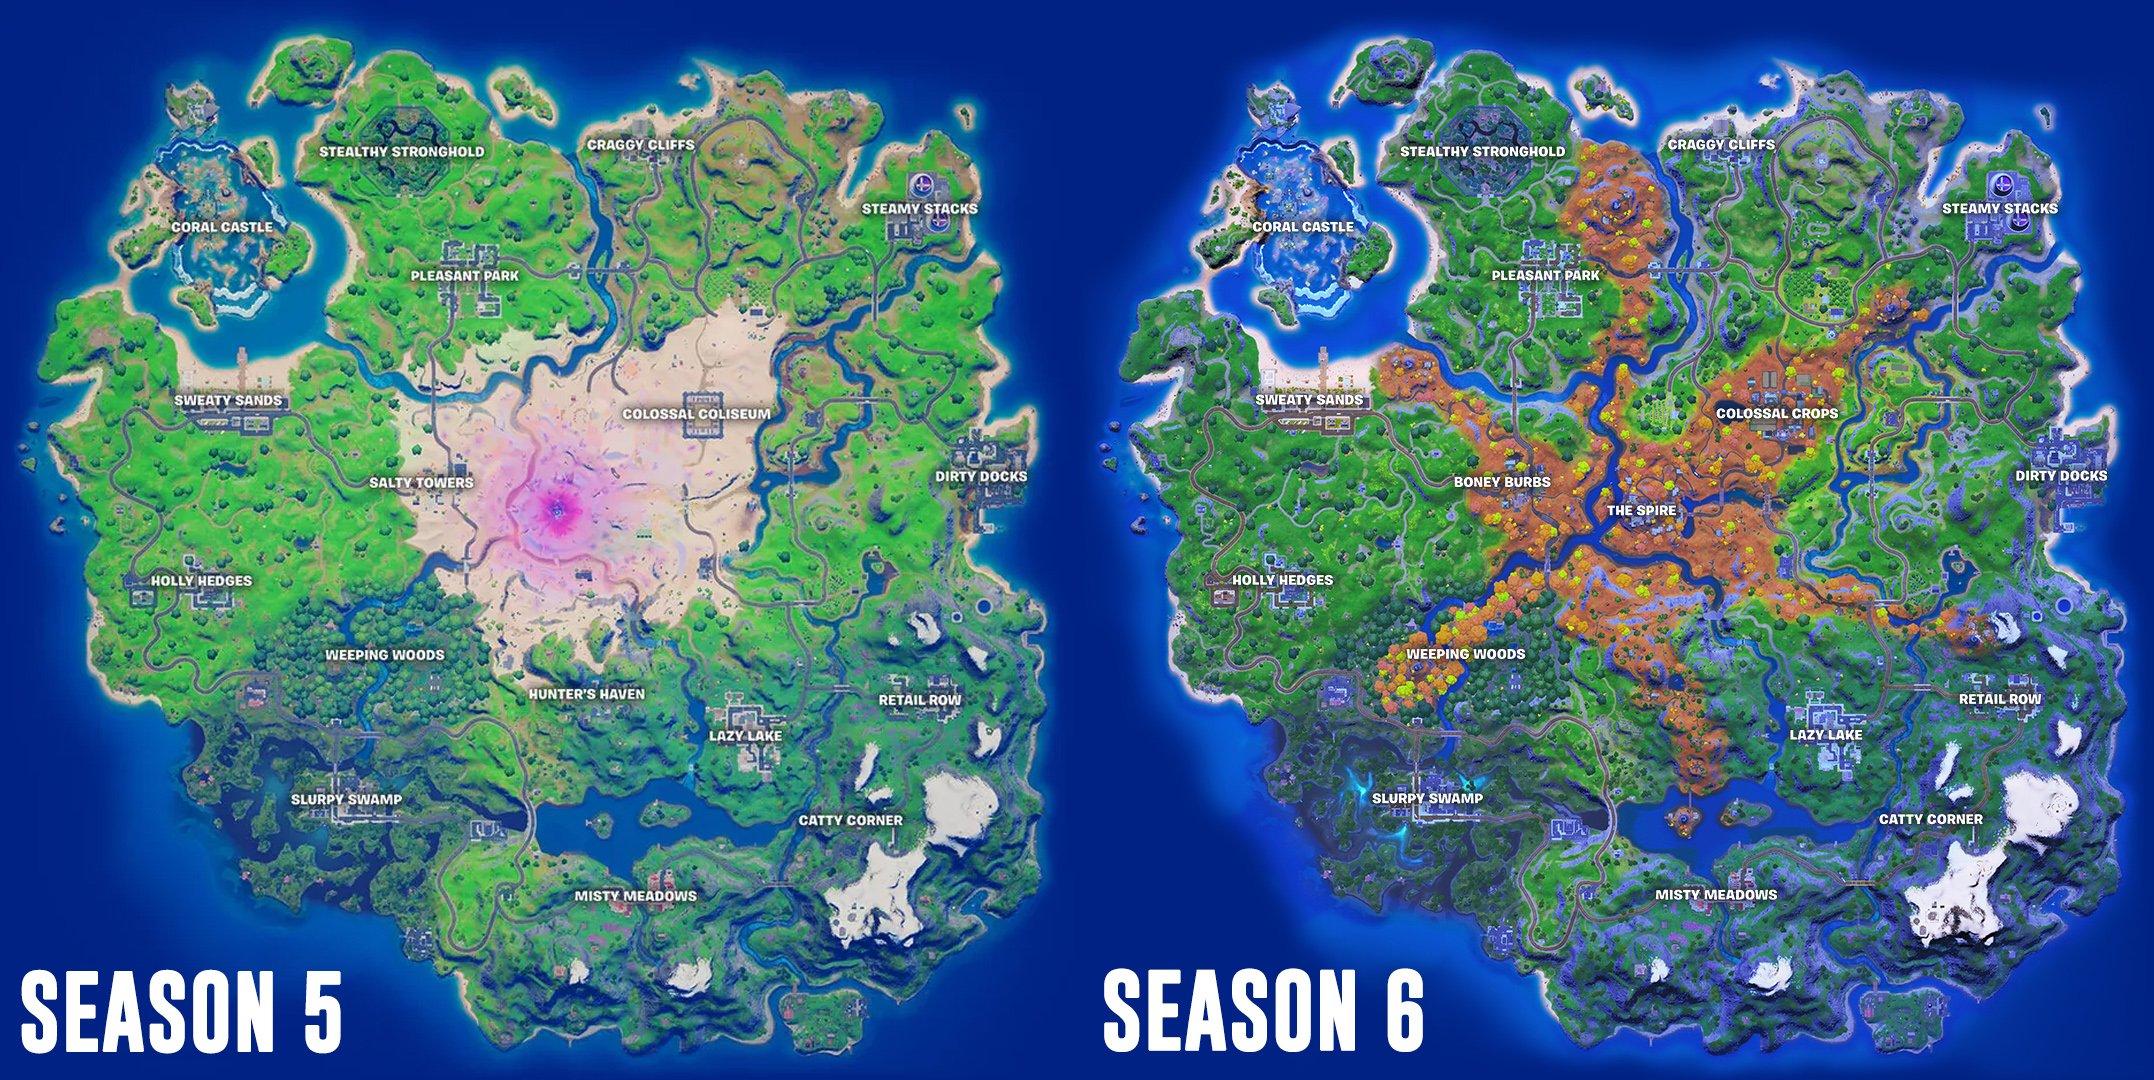 Fortnite Season 6 map changes comparison